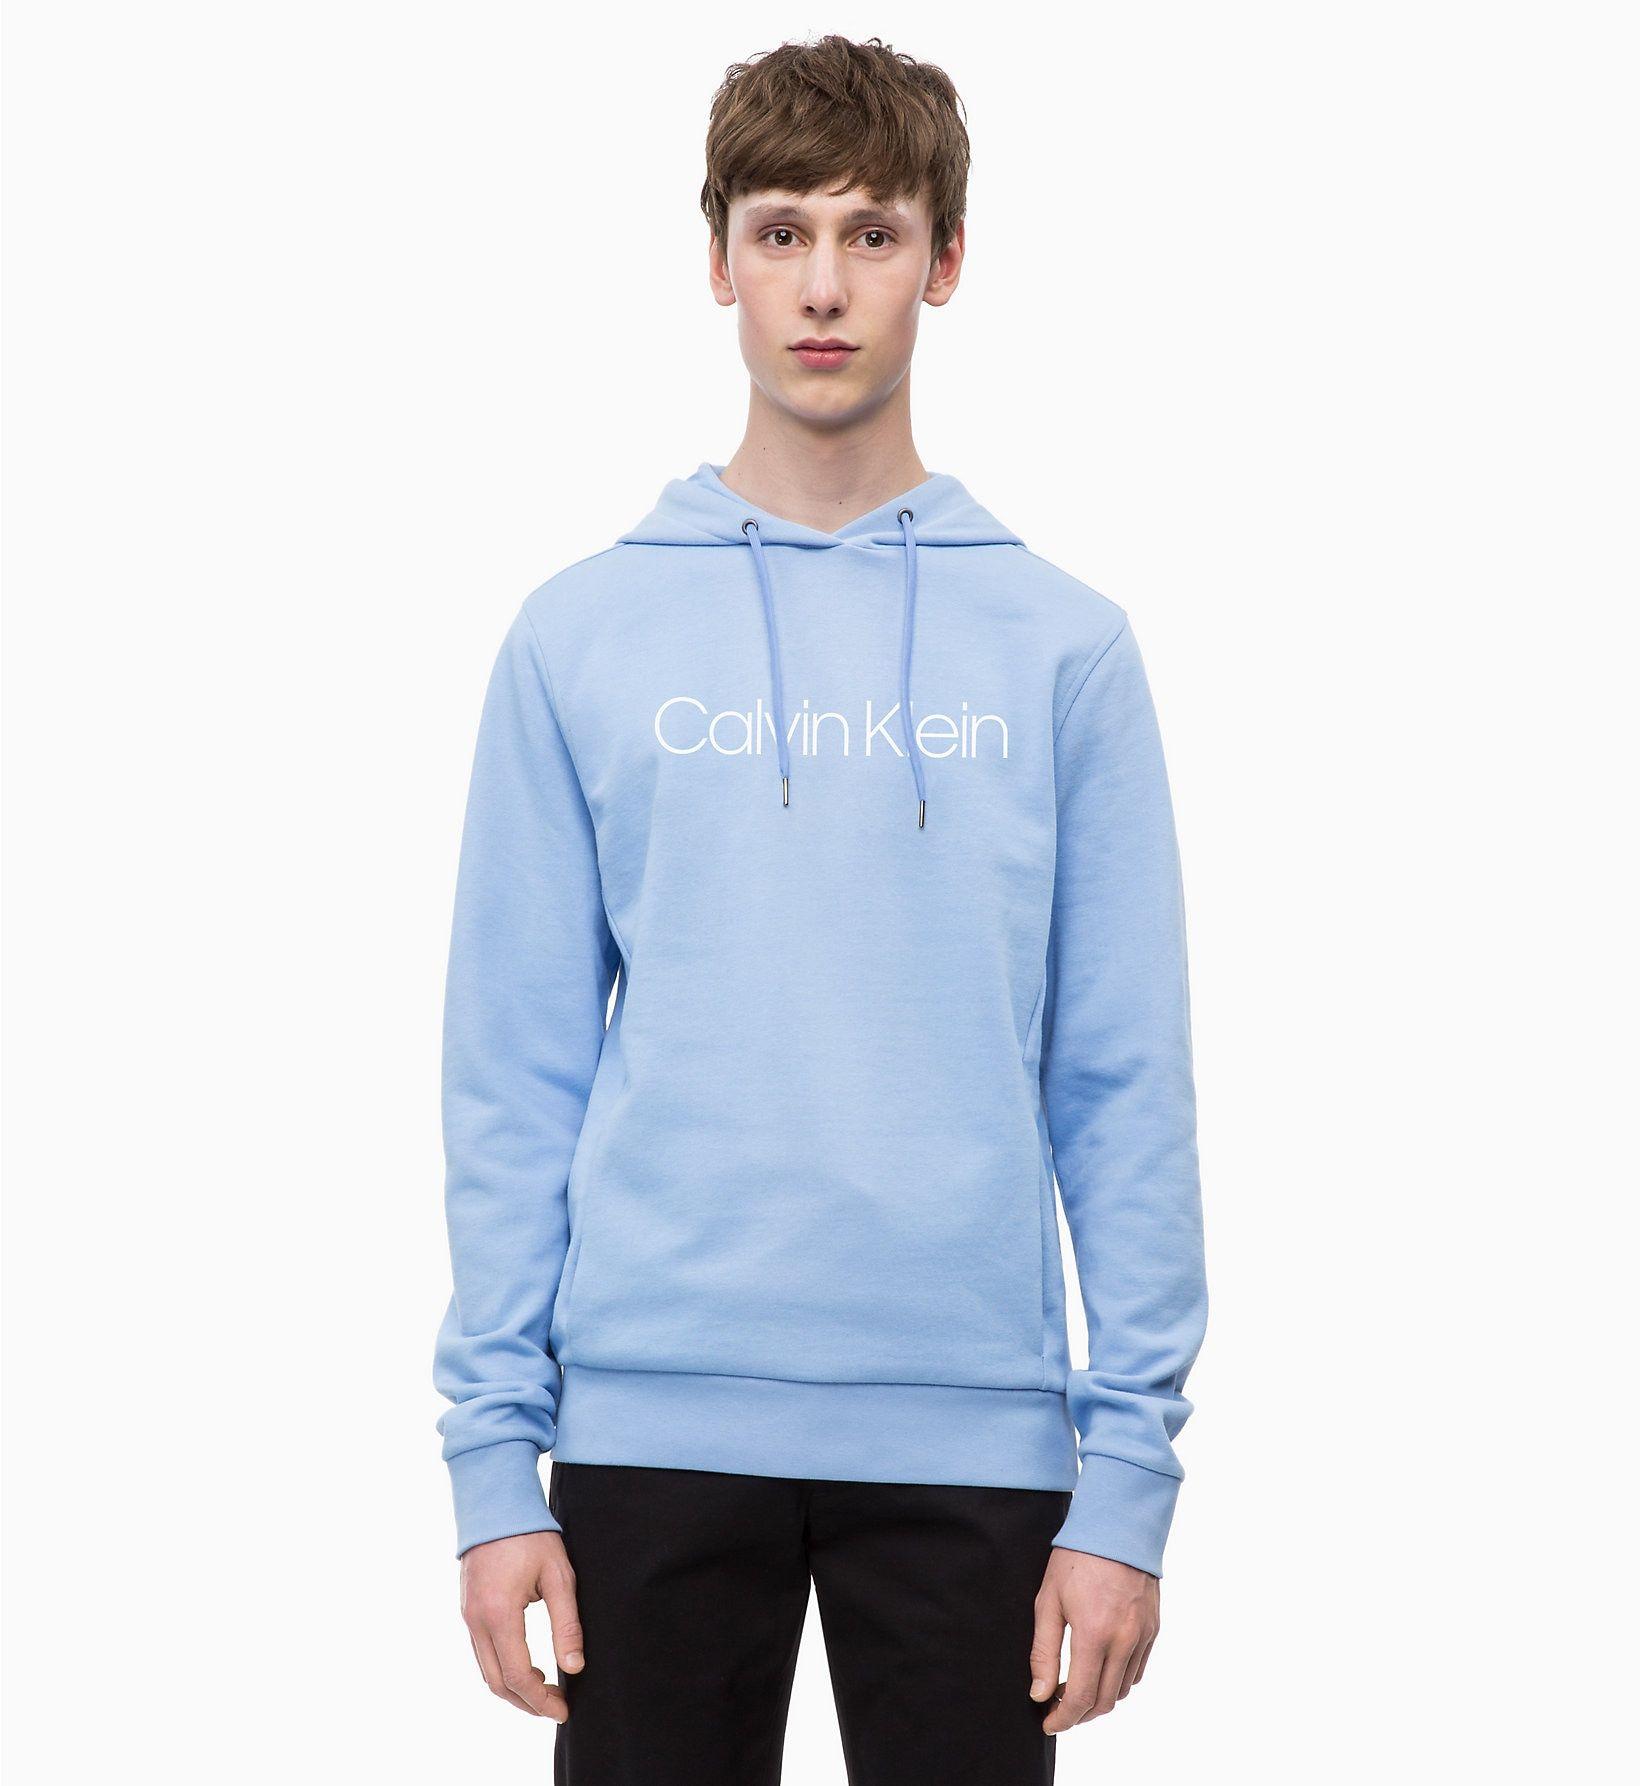 CALVINKLEIN Sweat shirt à capuche avec logo VISTA BLUE